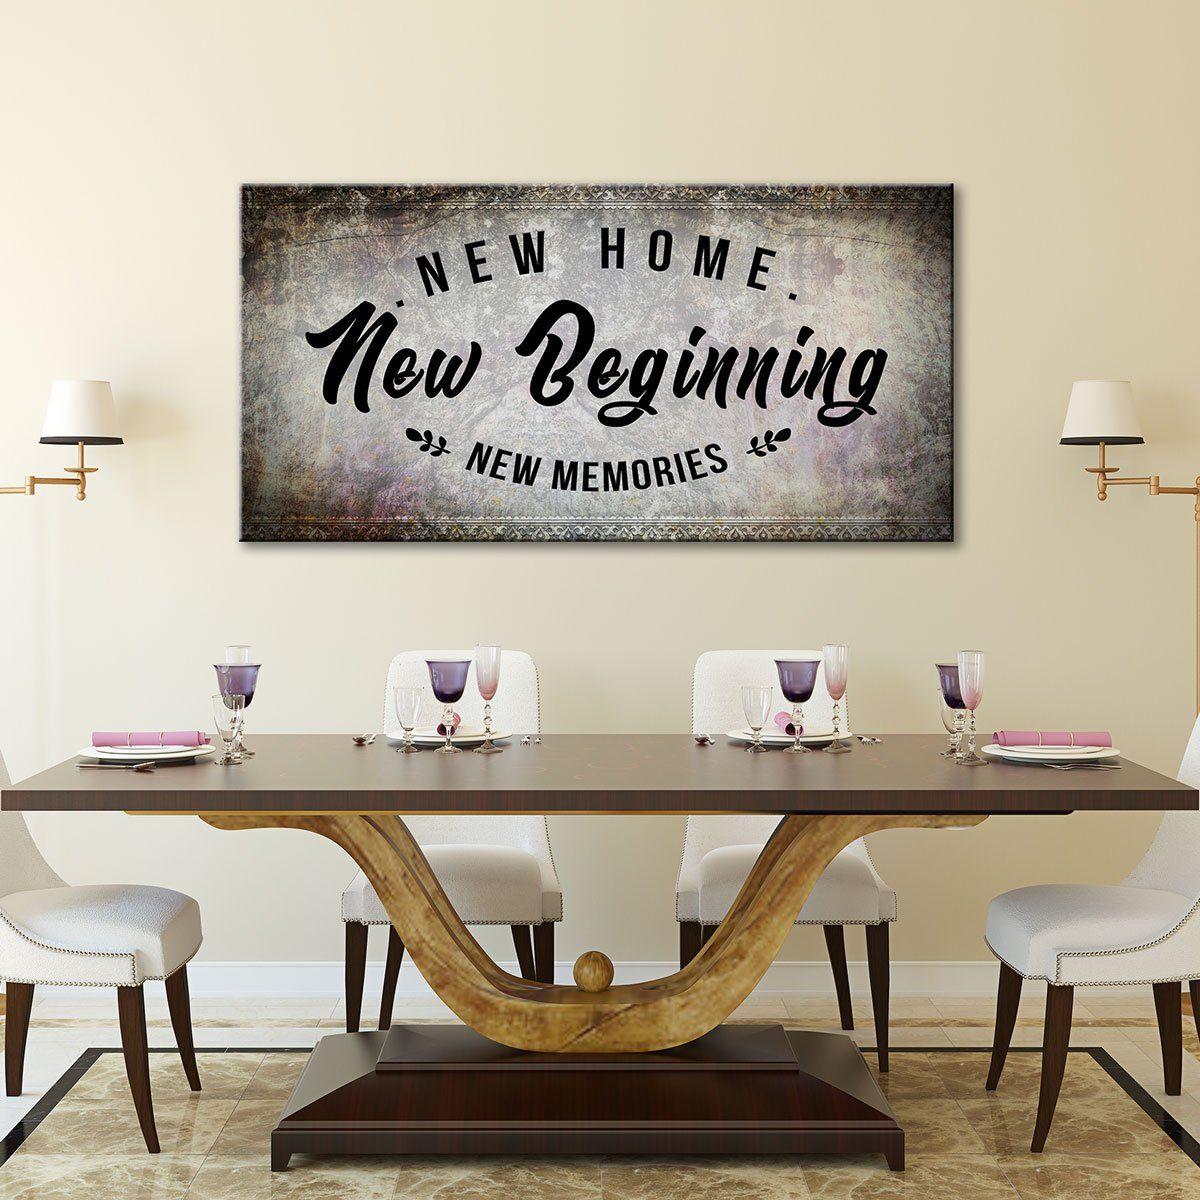 New Home New Beginning New Memories 5 panel canvas wall art